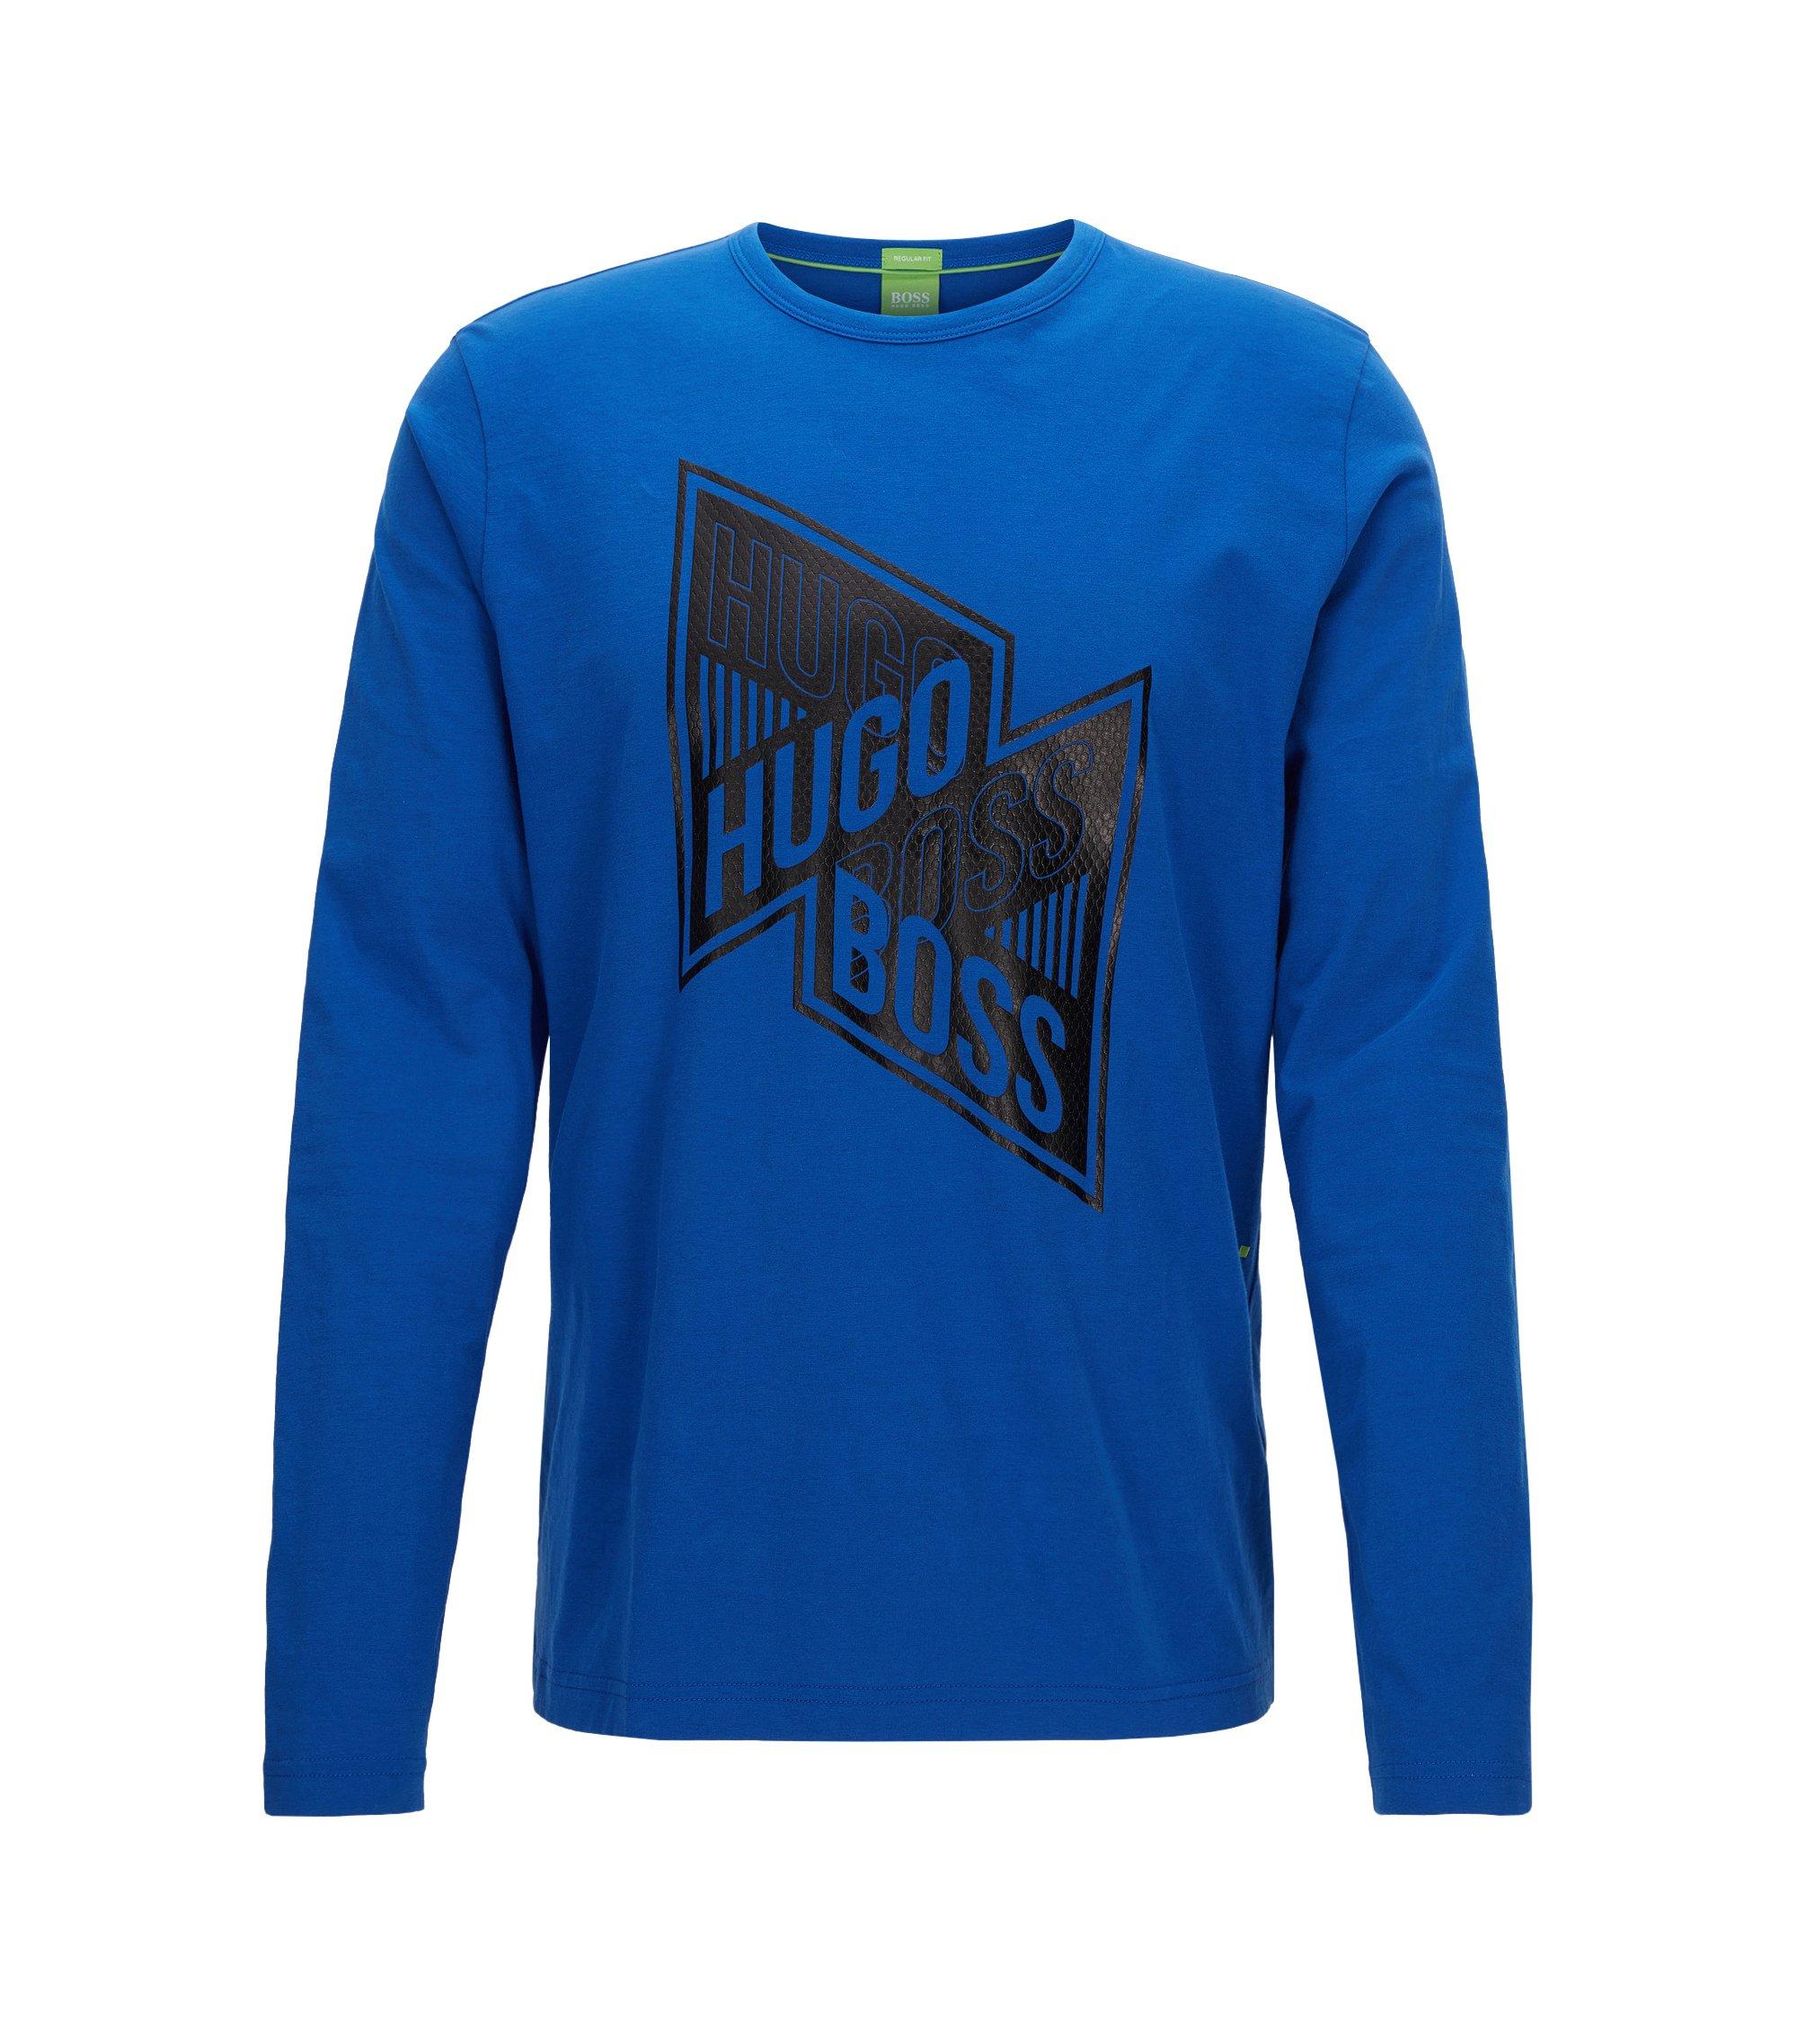 Stretch Cotton Graphic T-Shirt   Togn, Blue